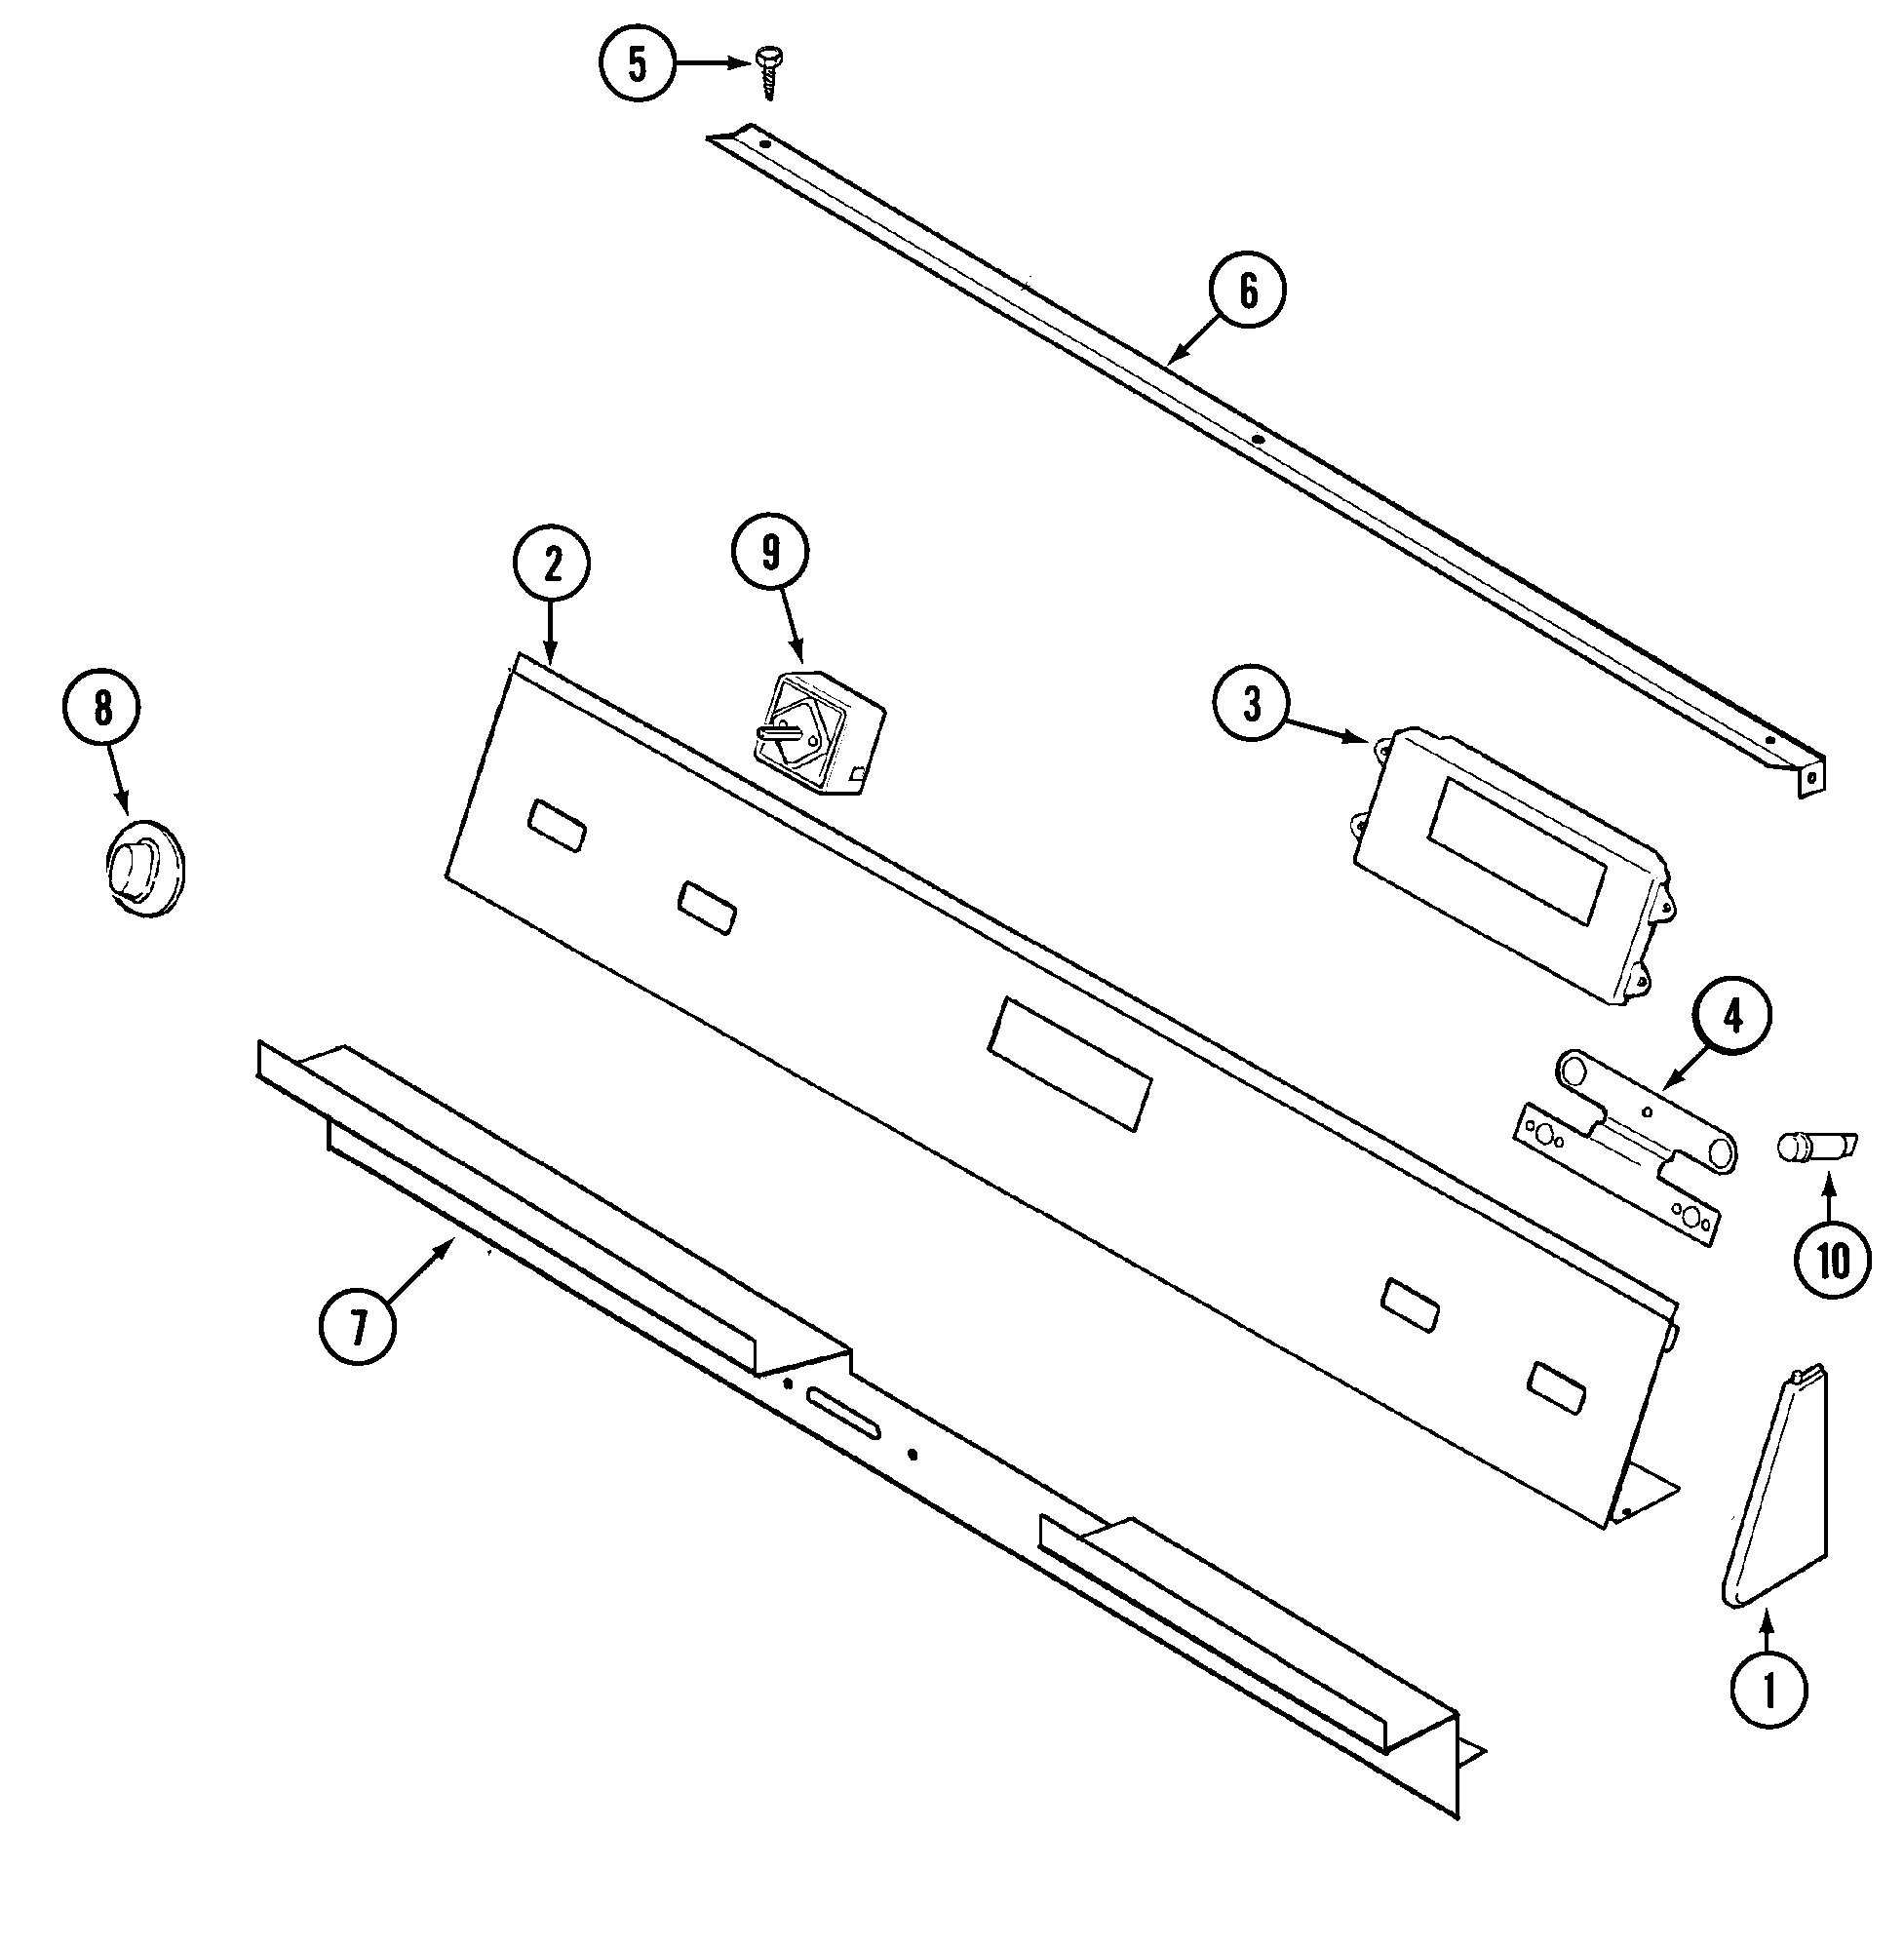 Jenn Air Model Sve47500b Slide In Range Electric Genuine Parts Diagram List For Mah22pnagw0 Maytagparts Washer